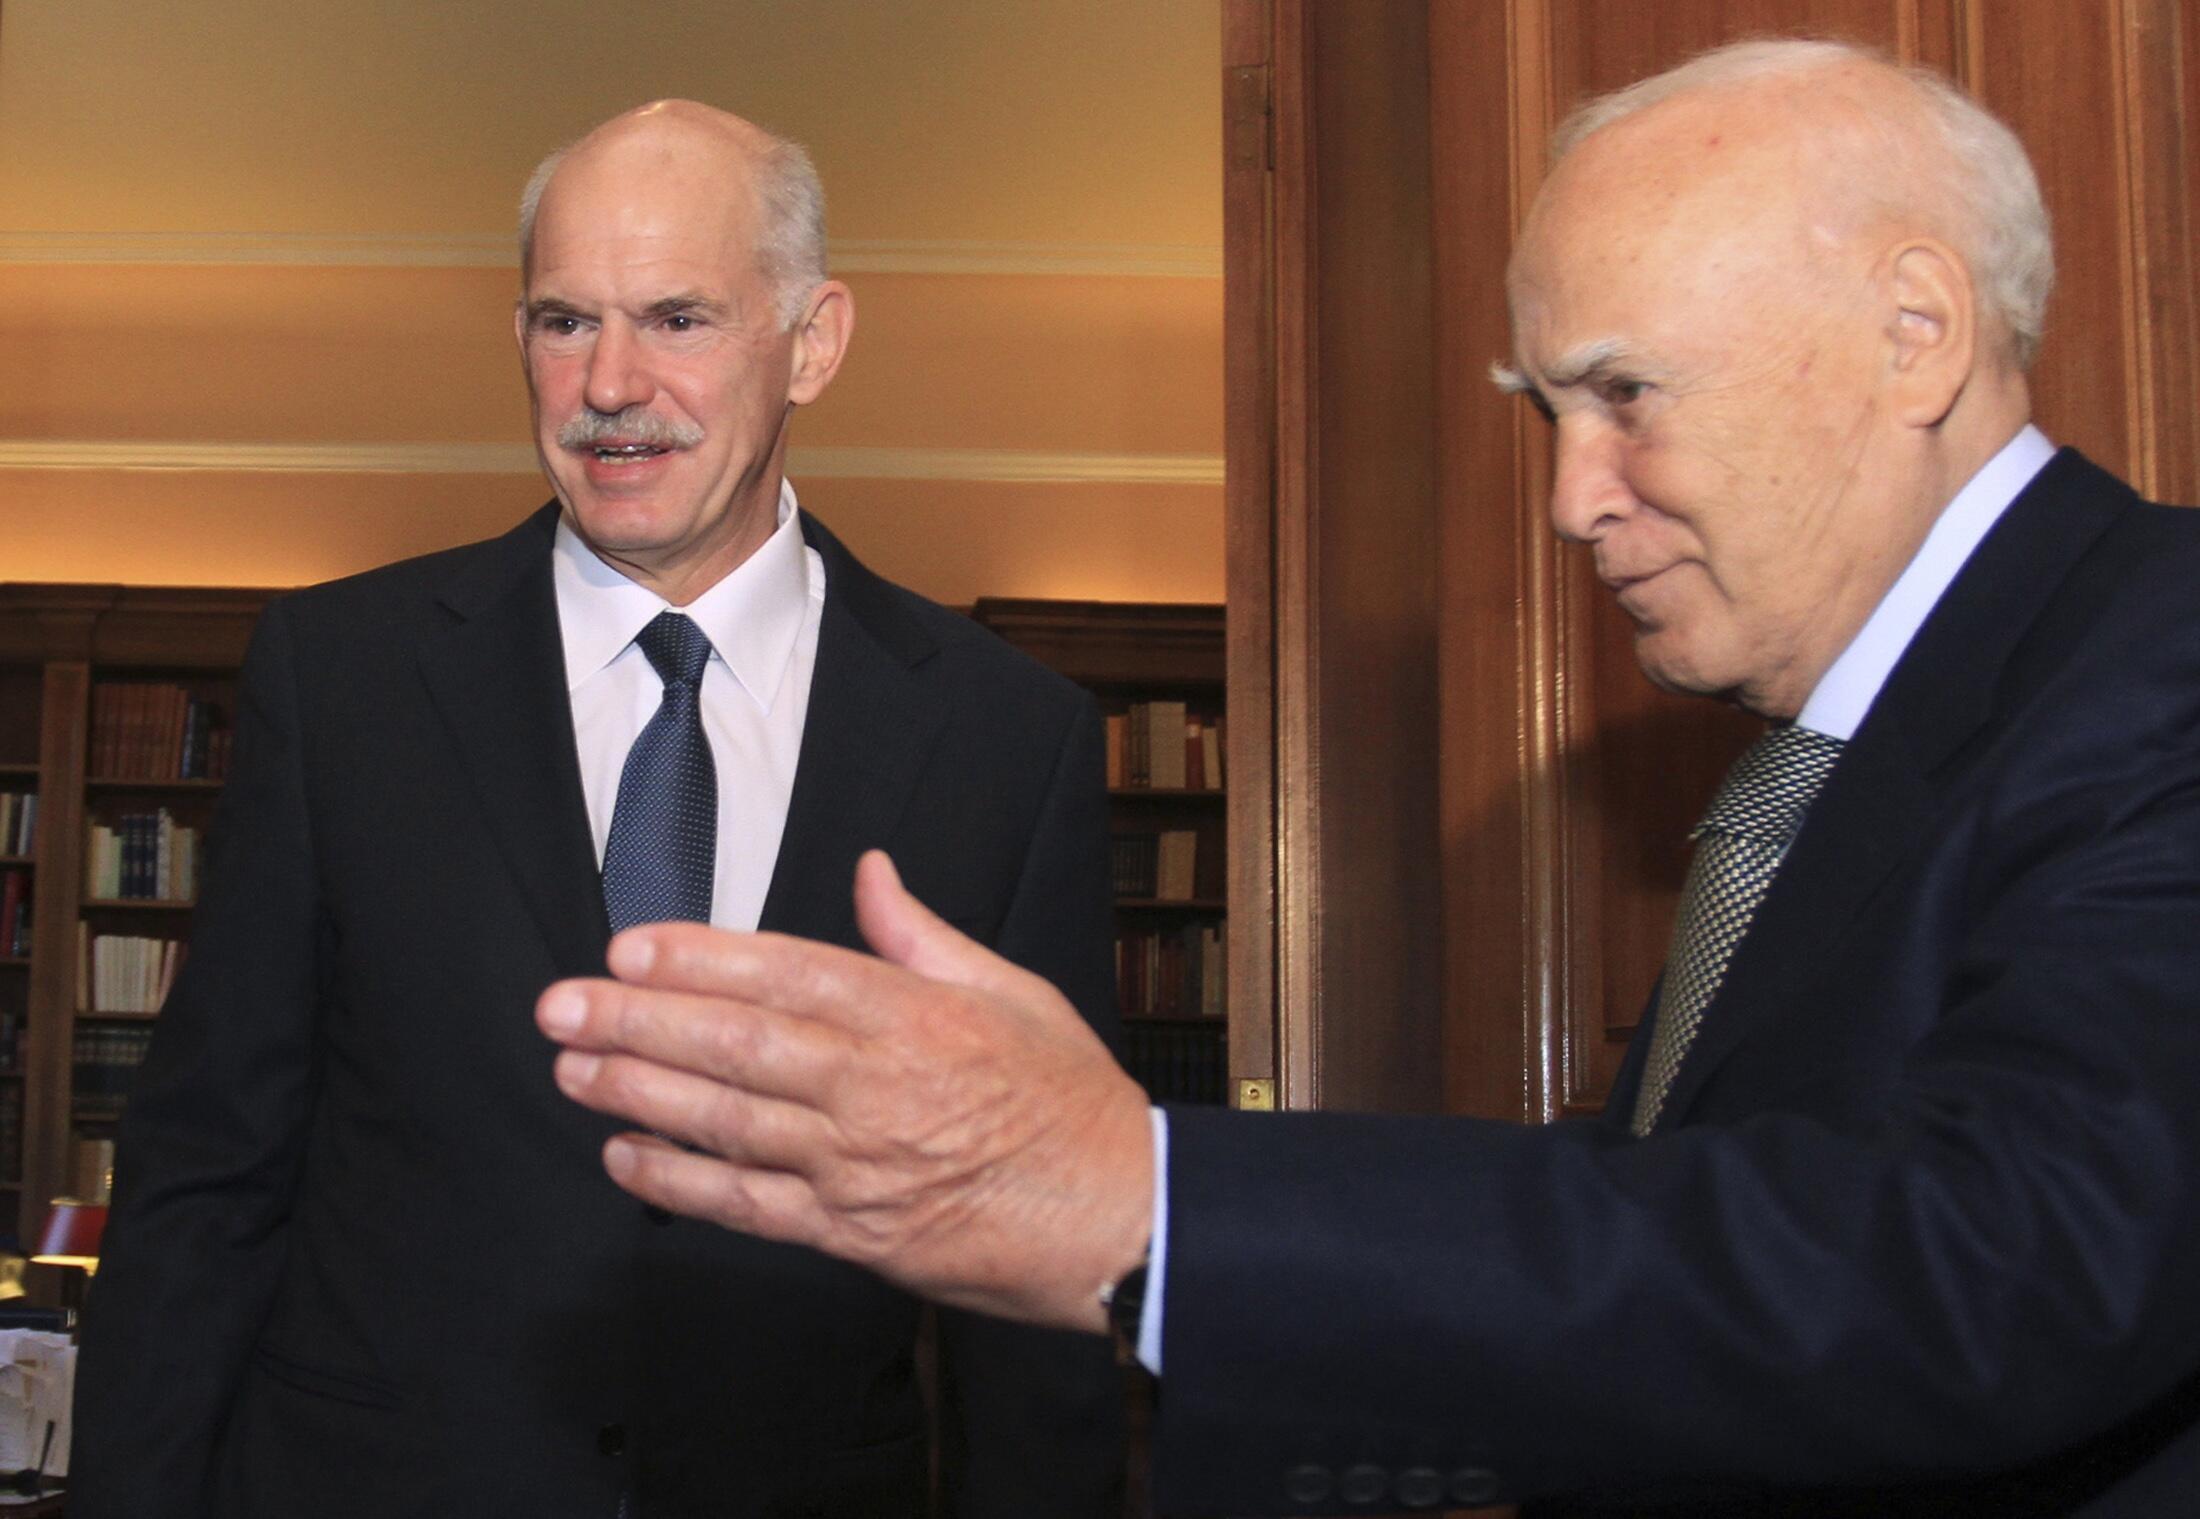 Президент (справа) и премьер-министр Греции Каролос Папулиас и Георгиос Папандреу